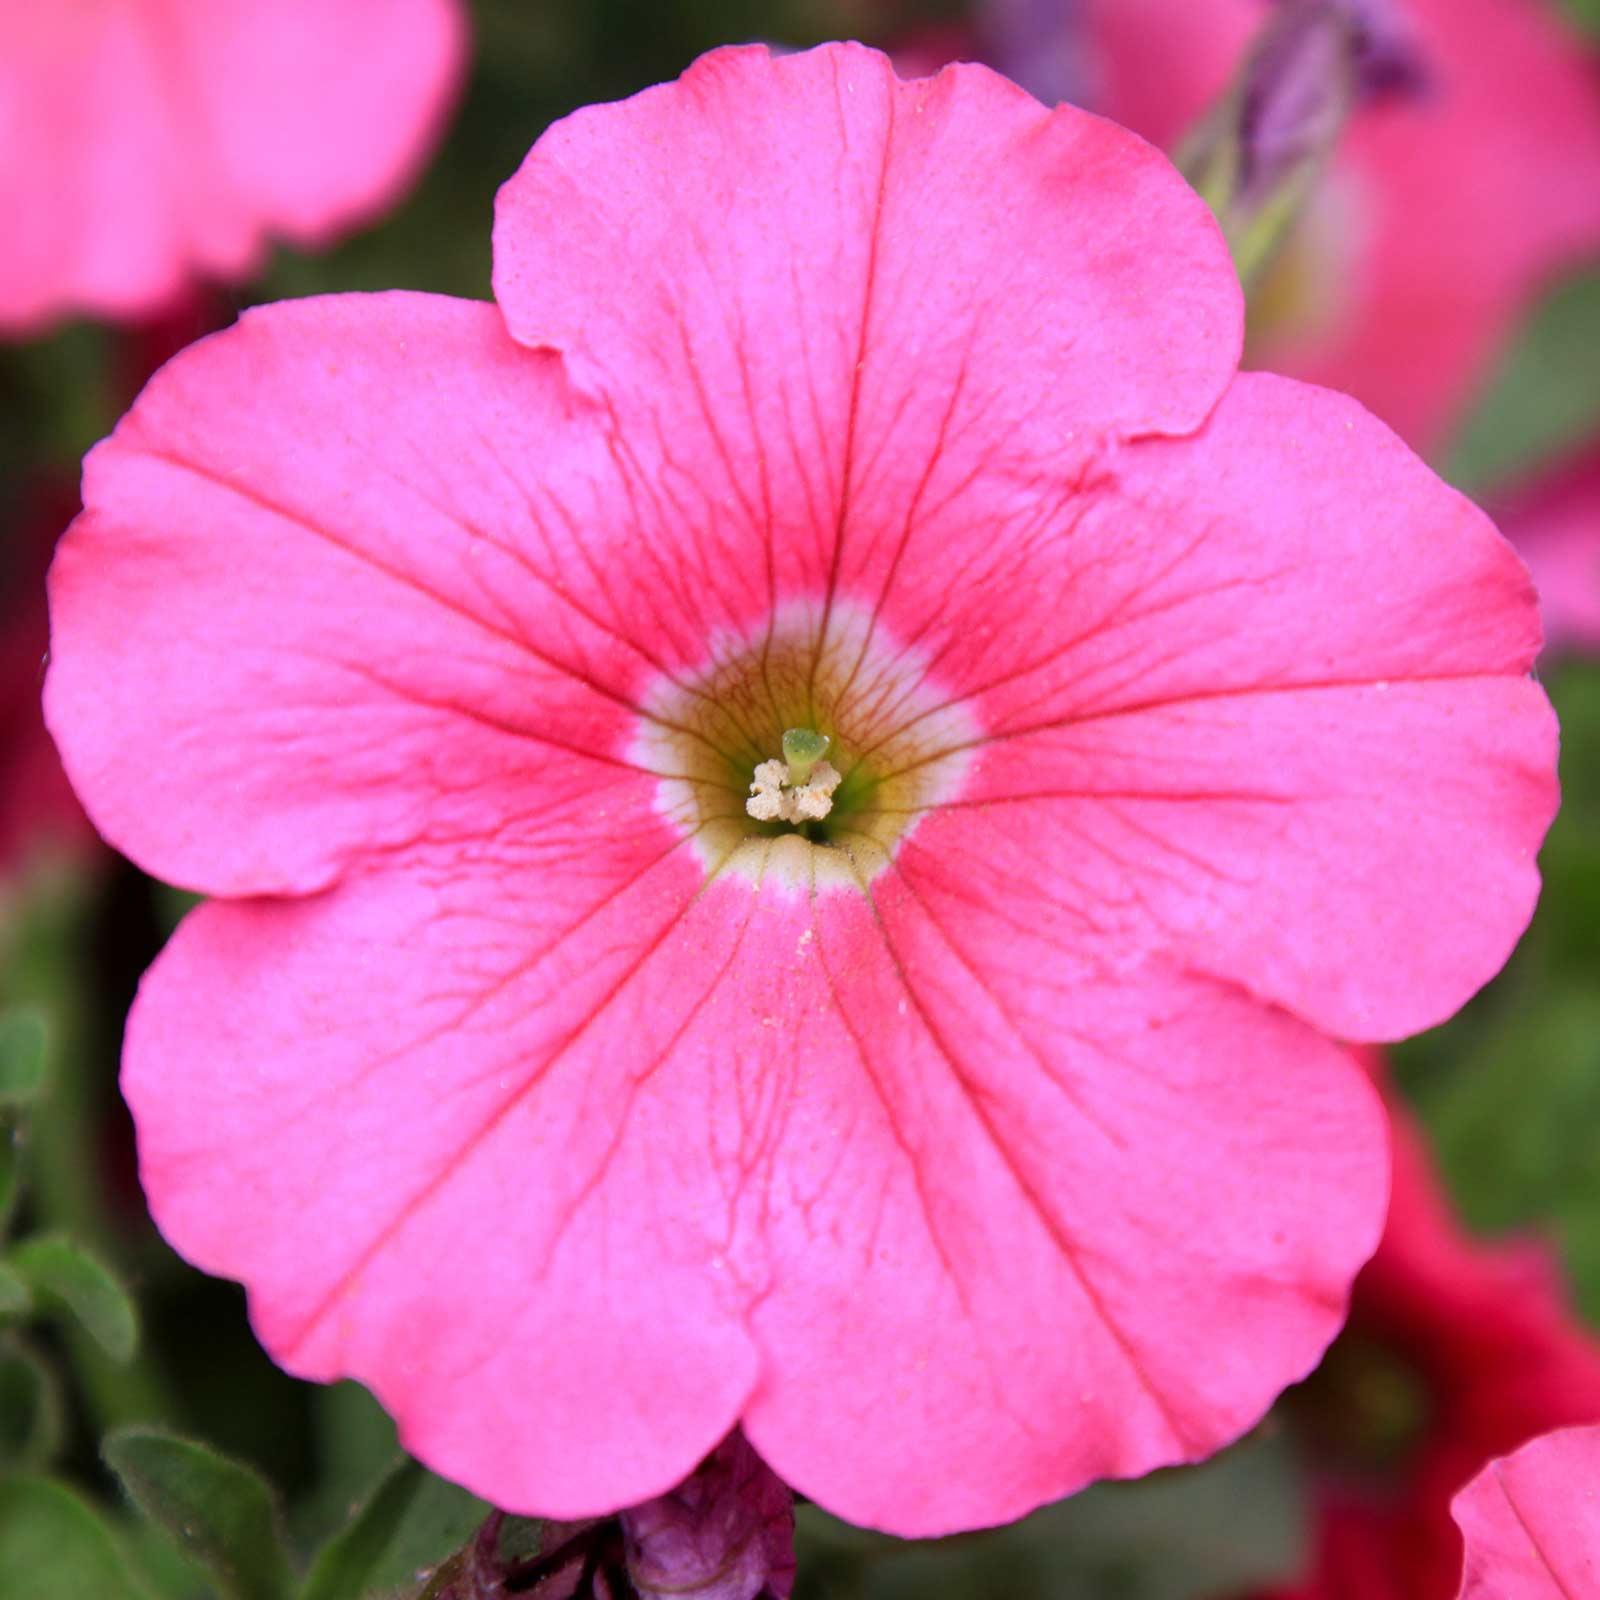 Petunia - Madness Series Flower Garden Seed - 1000 Pelleted Seeds - Burgundy Star Blooms - Annual Flowers - Single Floribunda Petunias